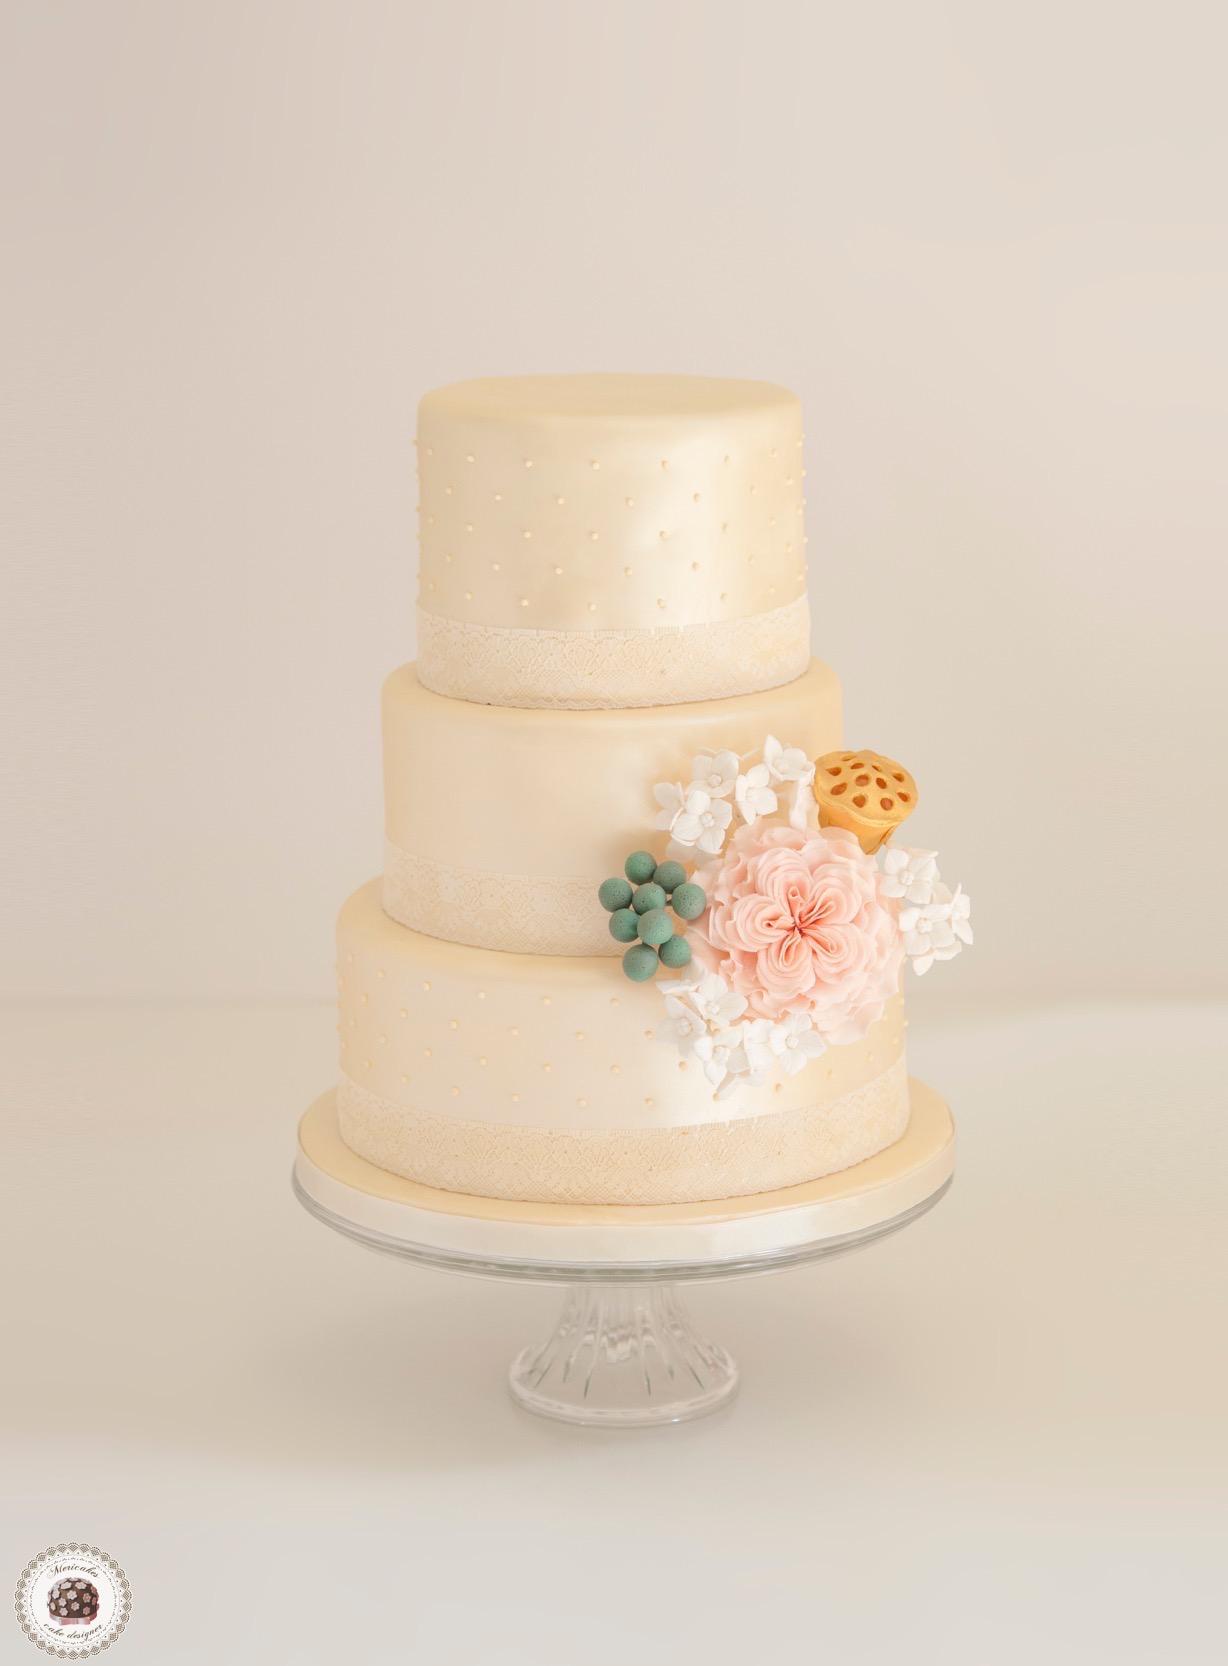 rose-pastel-wedding-cake-barcelona-weddings-dots-lace-hydrangea-sugarflowers